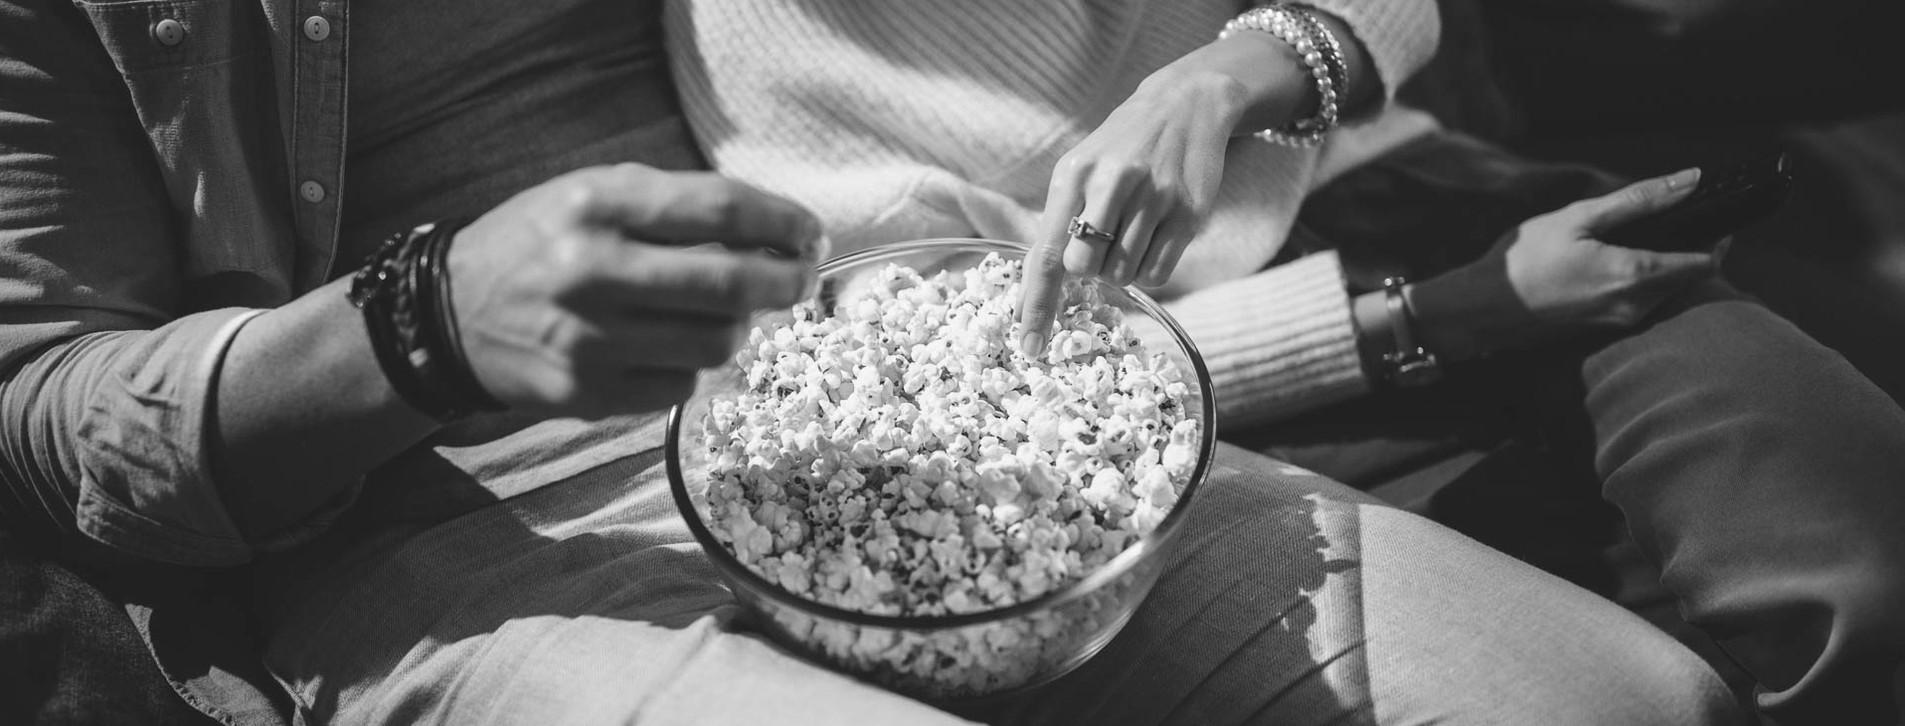 Фото - Романтическое свидание в кино